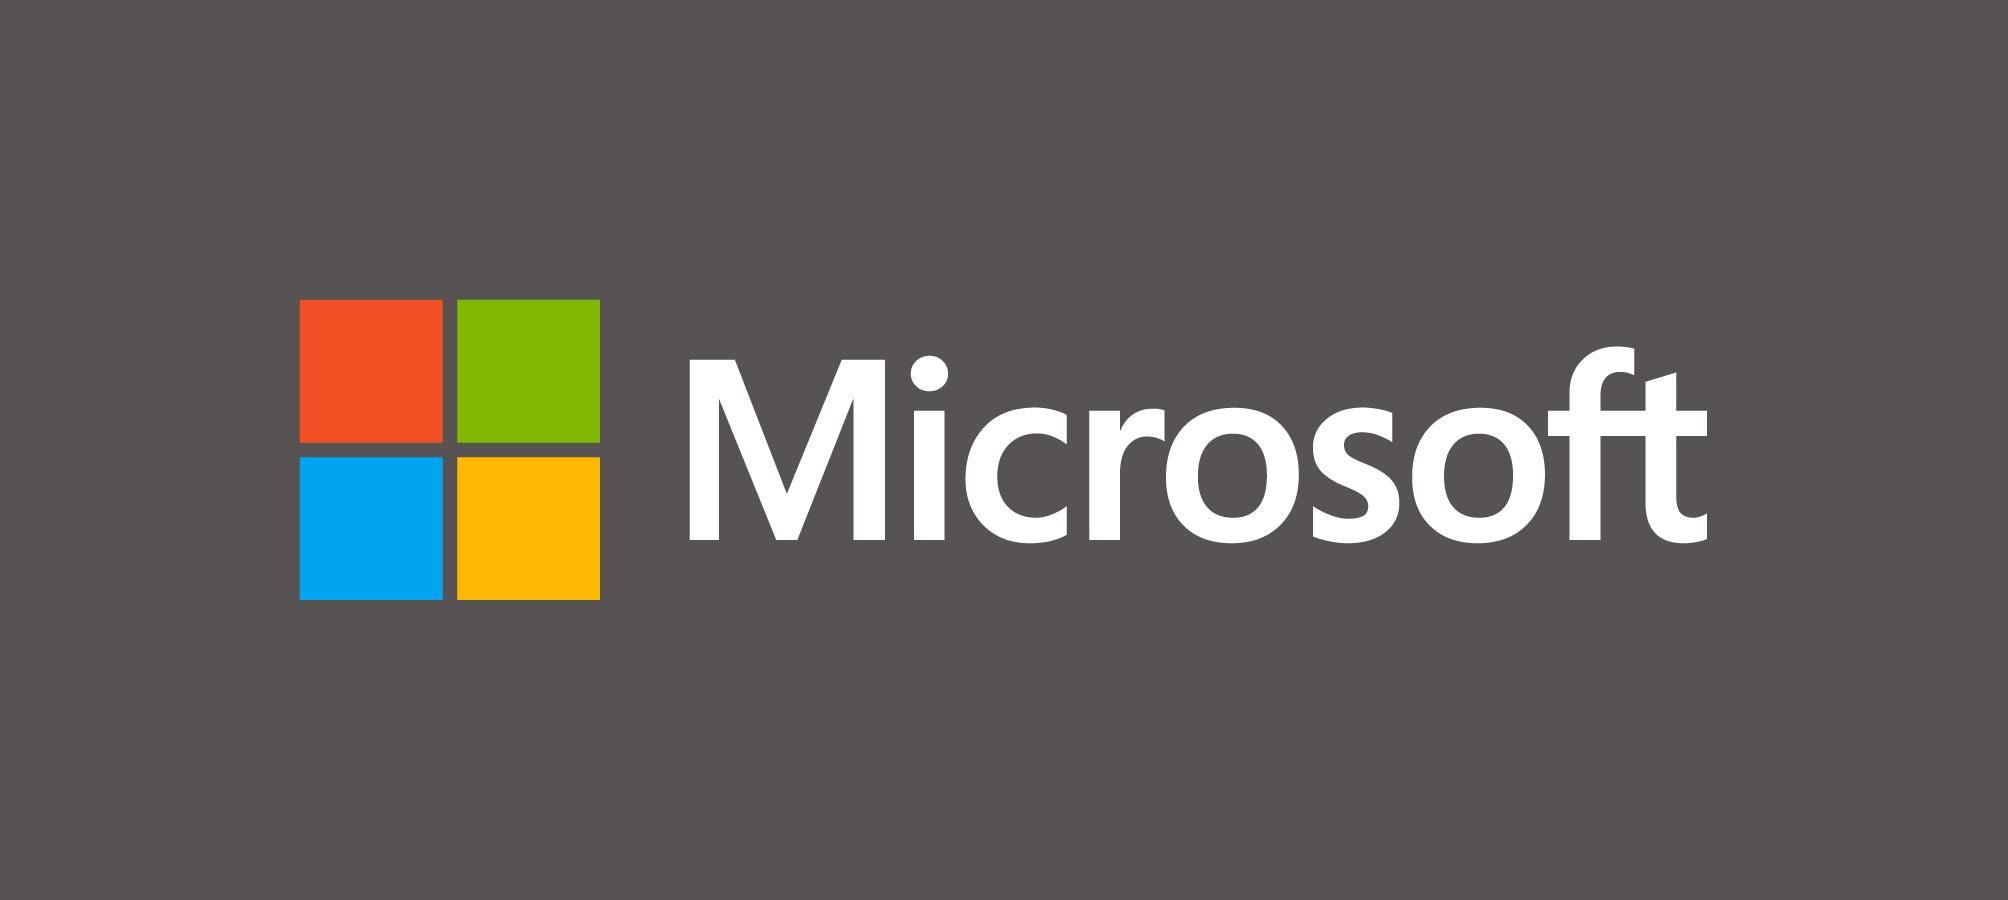 Microsoft's Digigirlz Empowers Young Filipinas to Advance STEM Fields